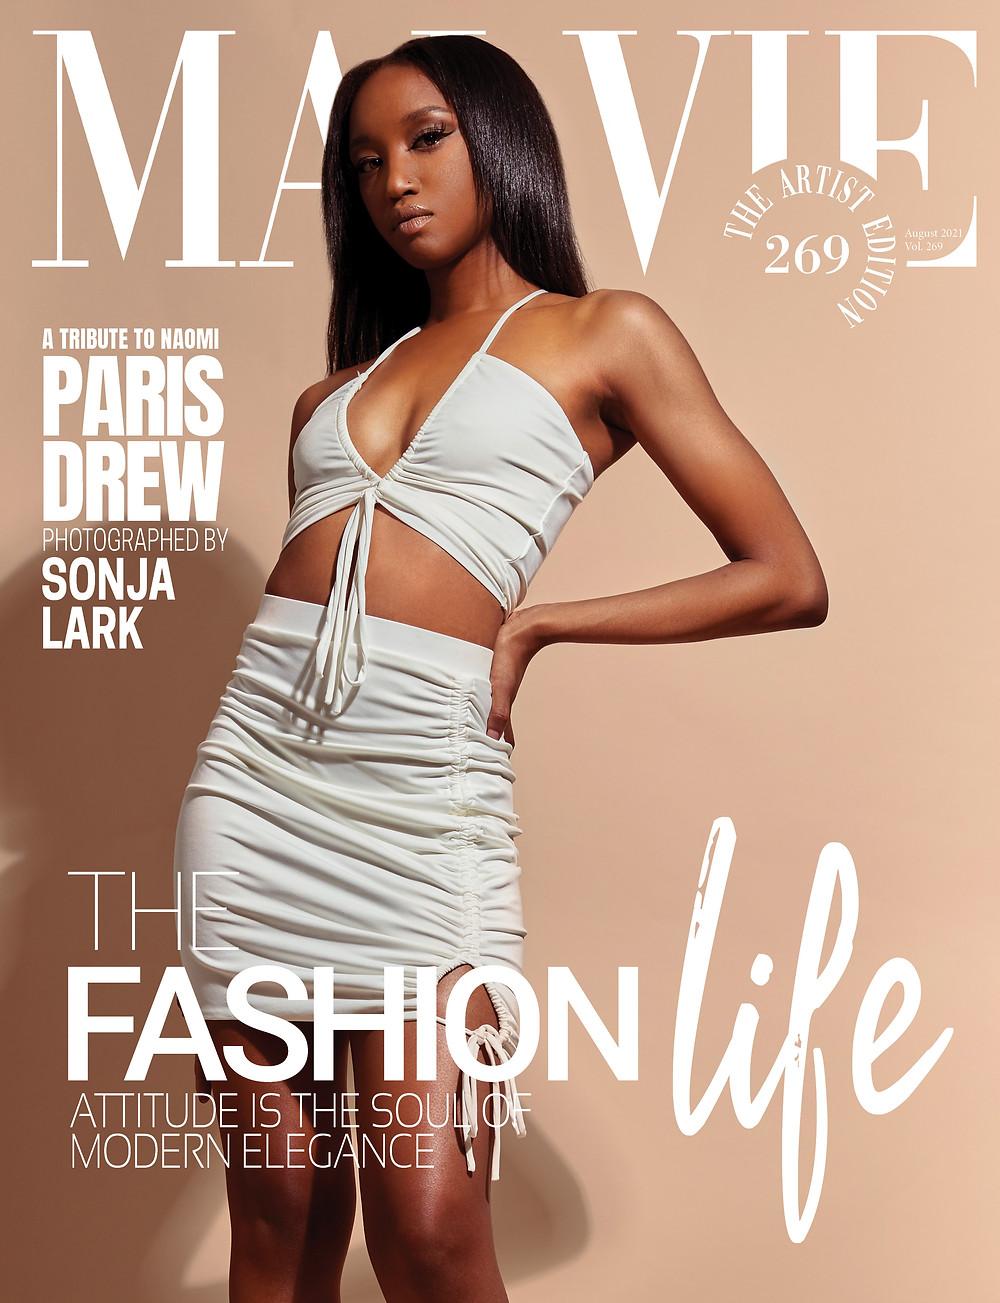 Fashion Designer/Photographer: Sonja Lark @tempetestudios Model: Paris Drew @babyp_22 @tempetestudios Makeup Artist: Eva Gonzalez @eva_glez  Hair Stylist: Quinci Lonnie  @qmajor